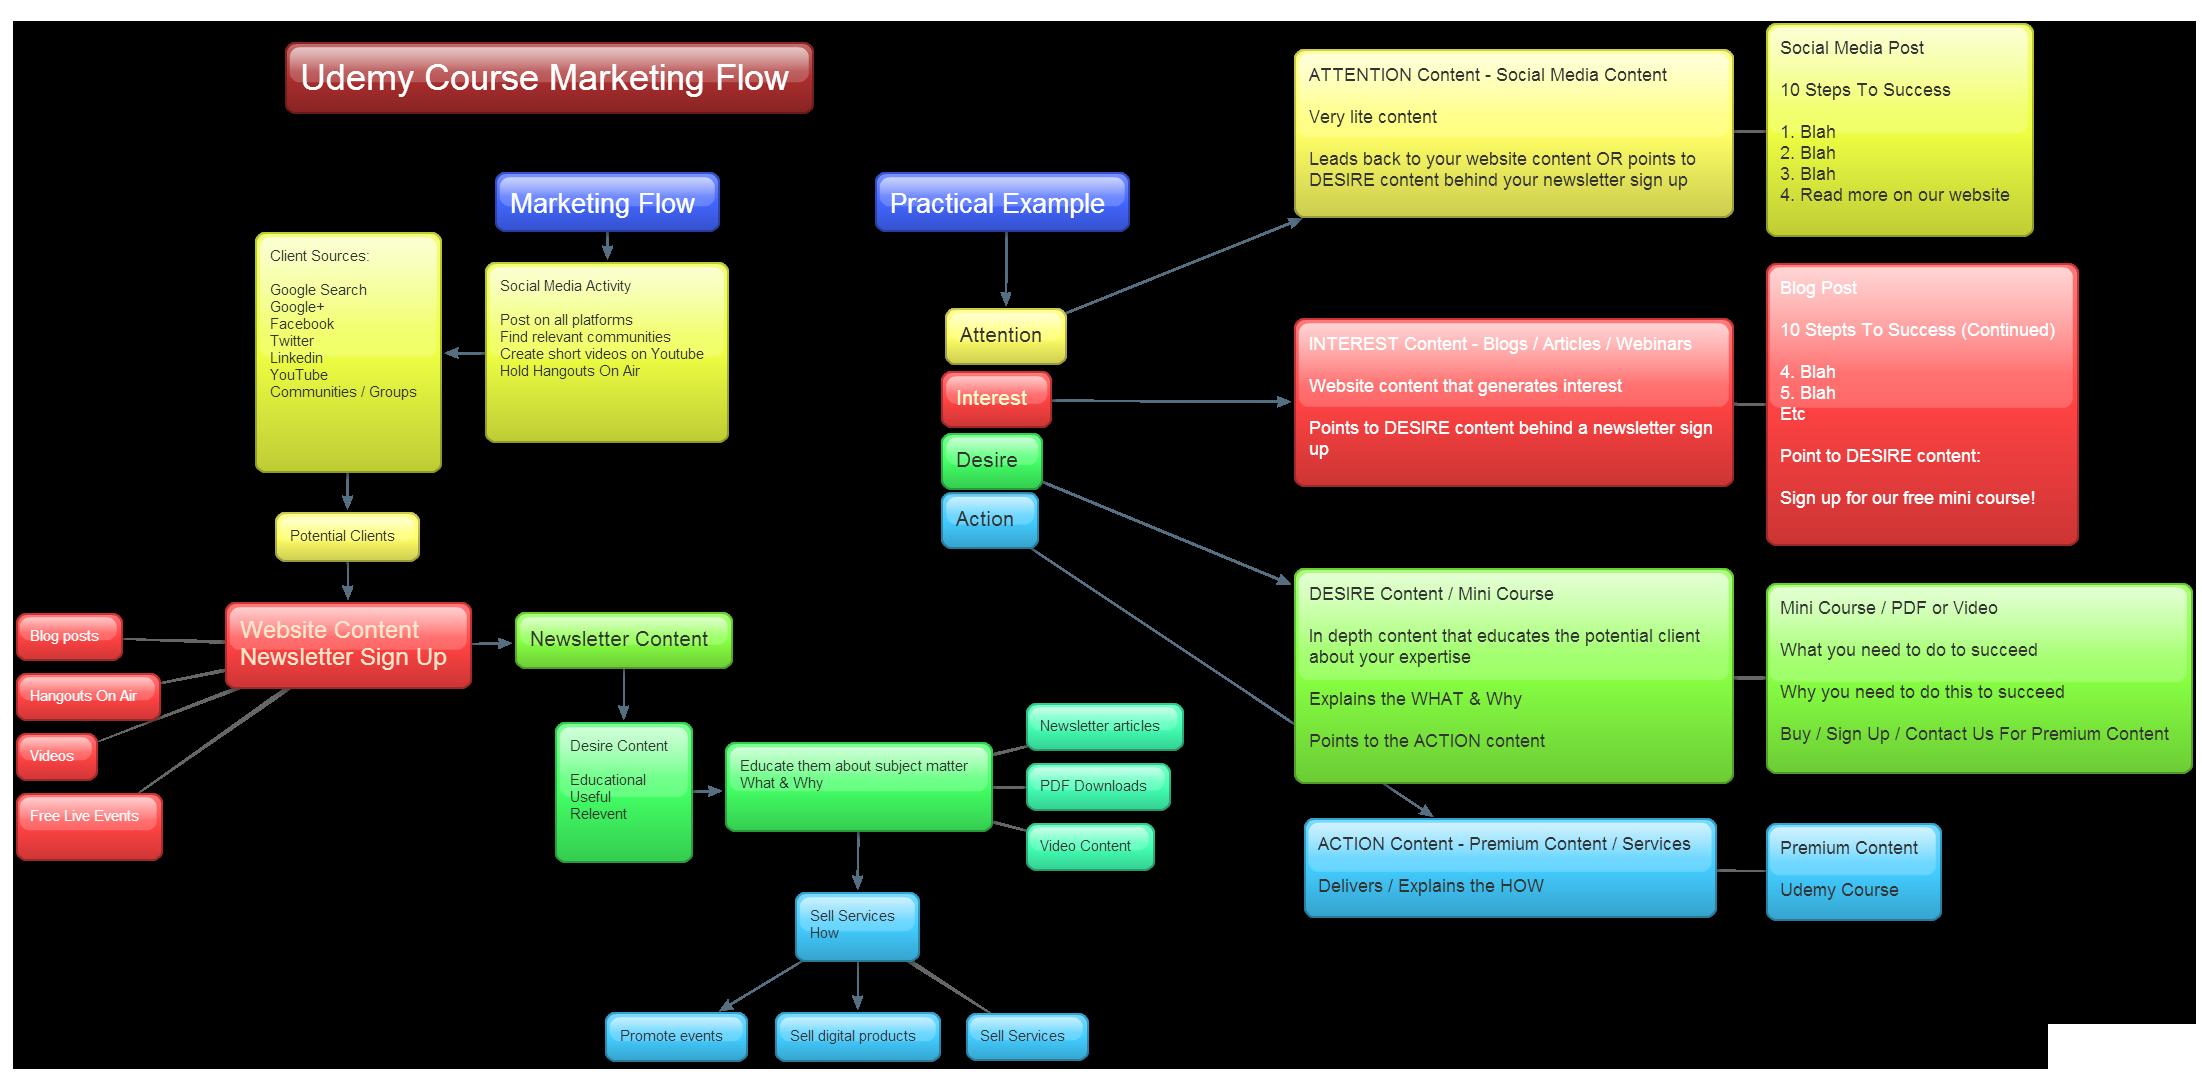 Udemy Marketing Flow.png